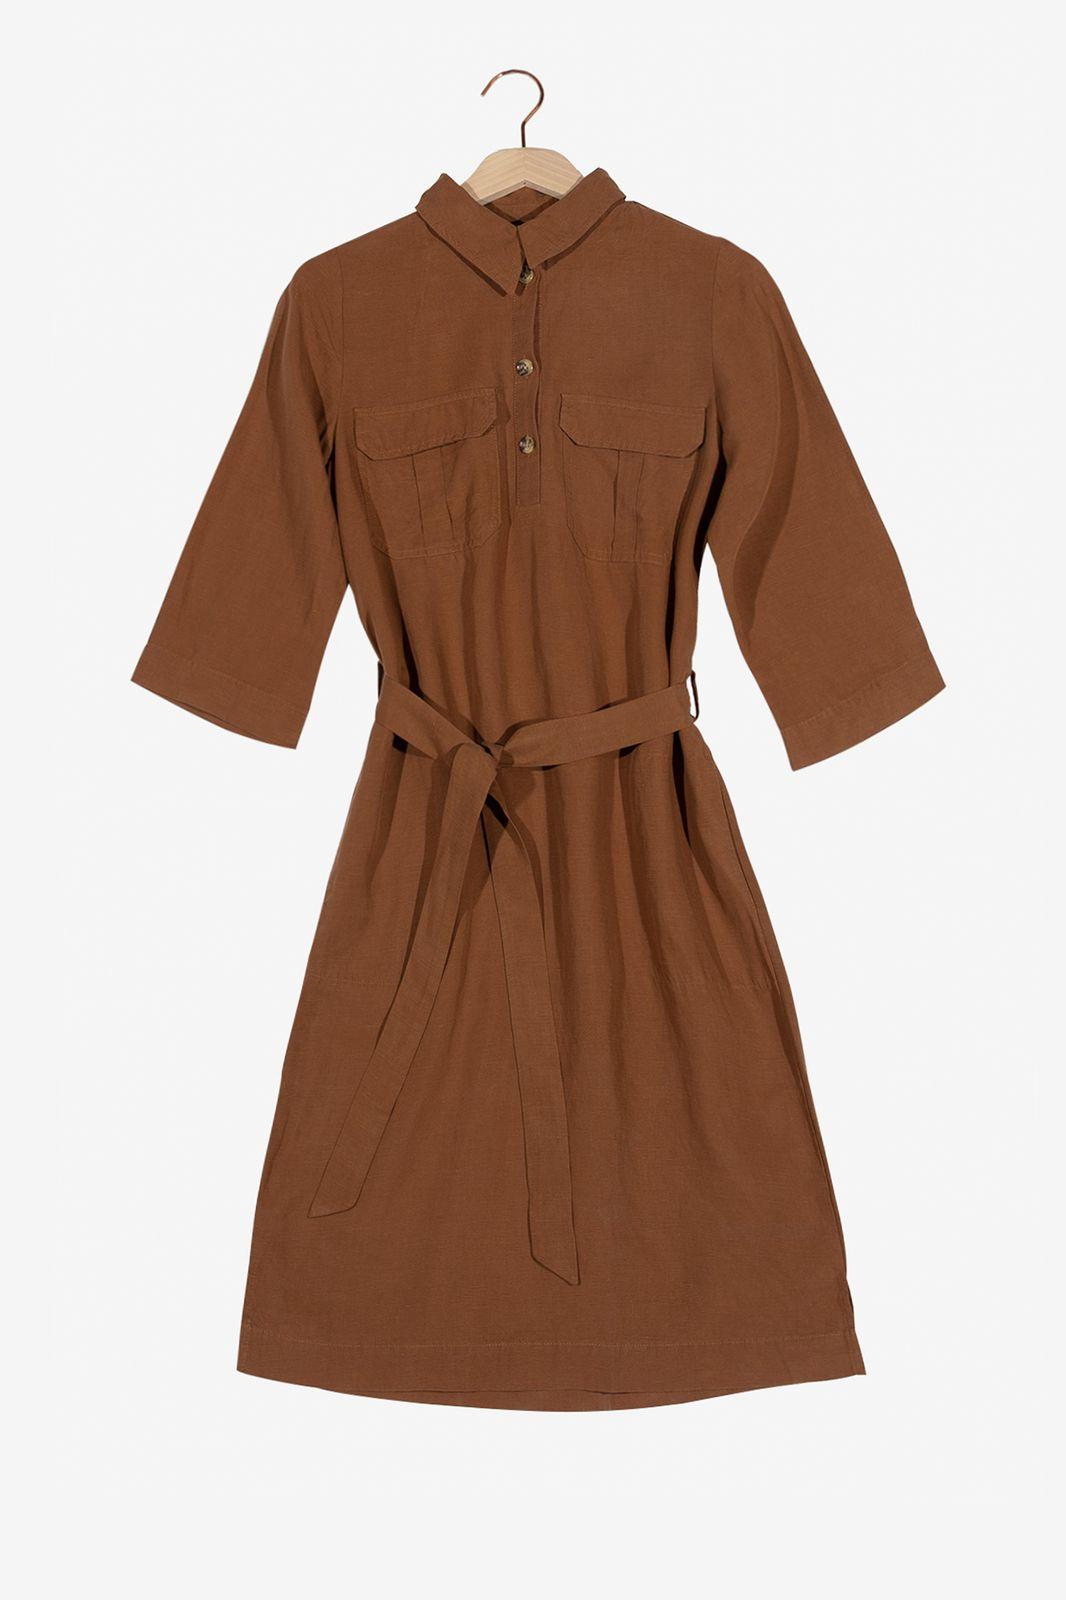 Bruine midi jurk met korte mouwen